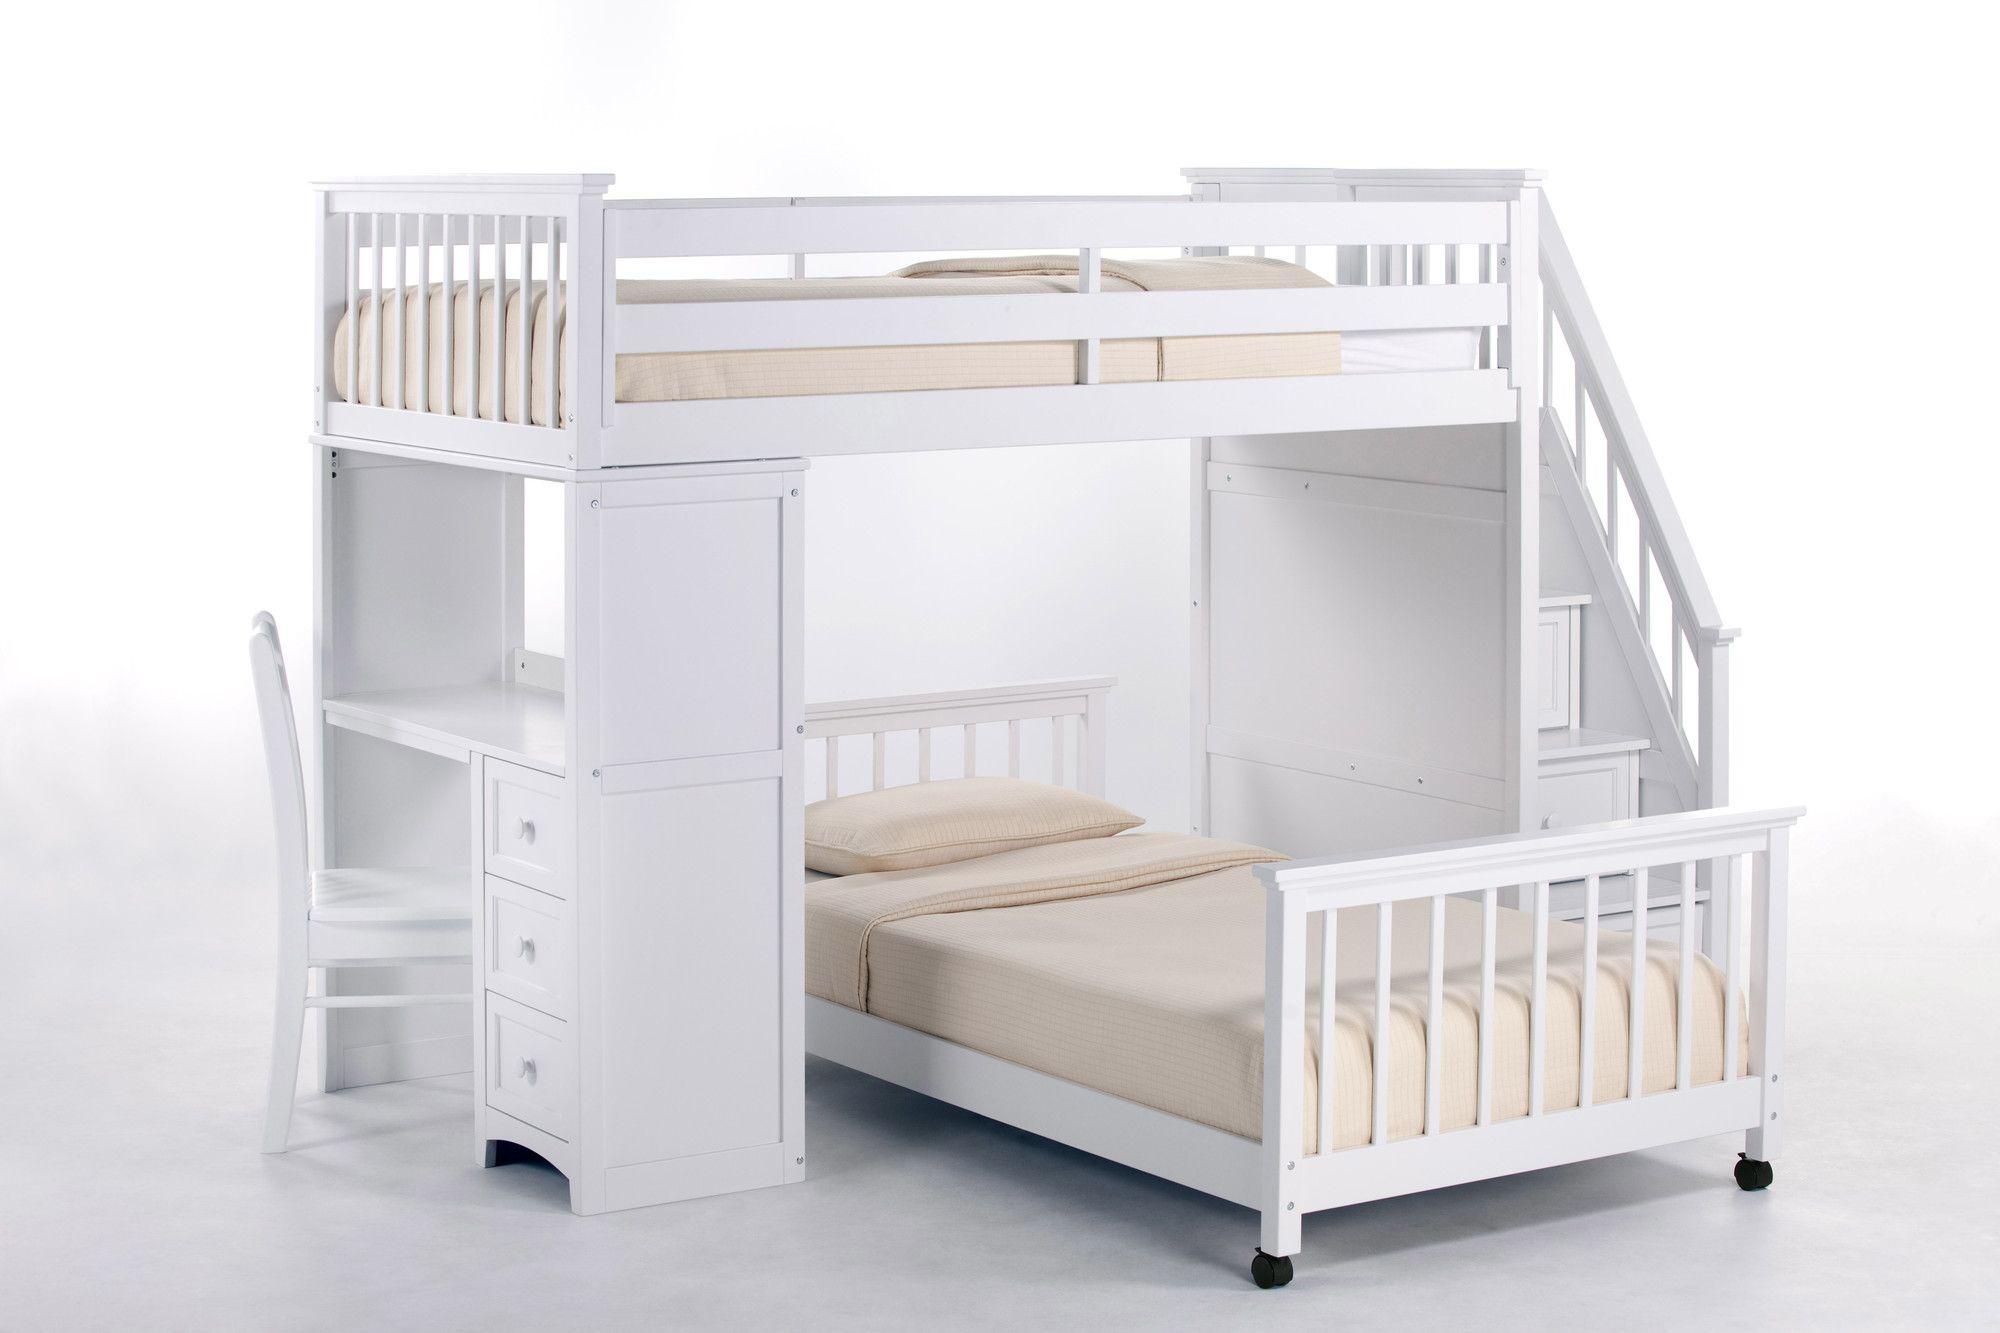 School House Stair Loft Bed with Desk End Wayfair Bunk